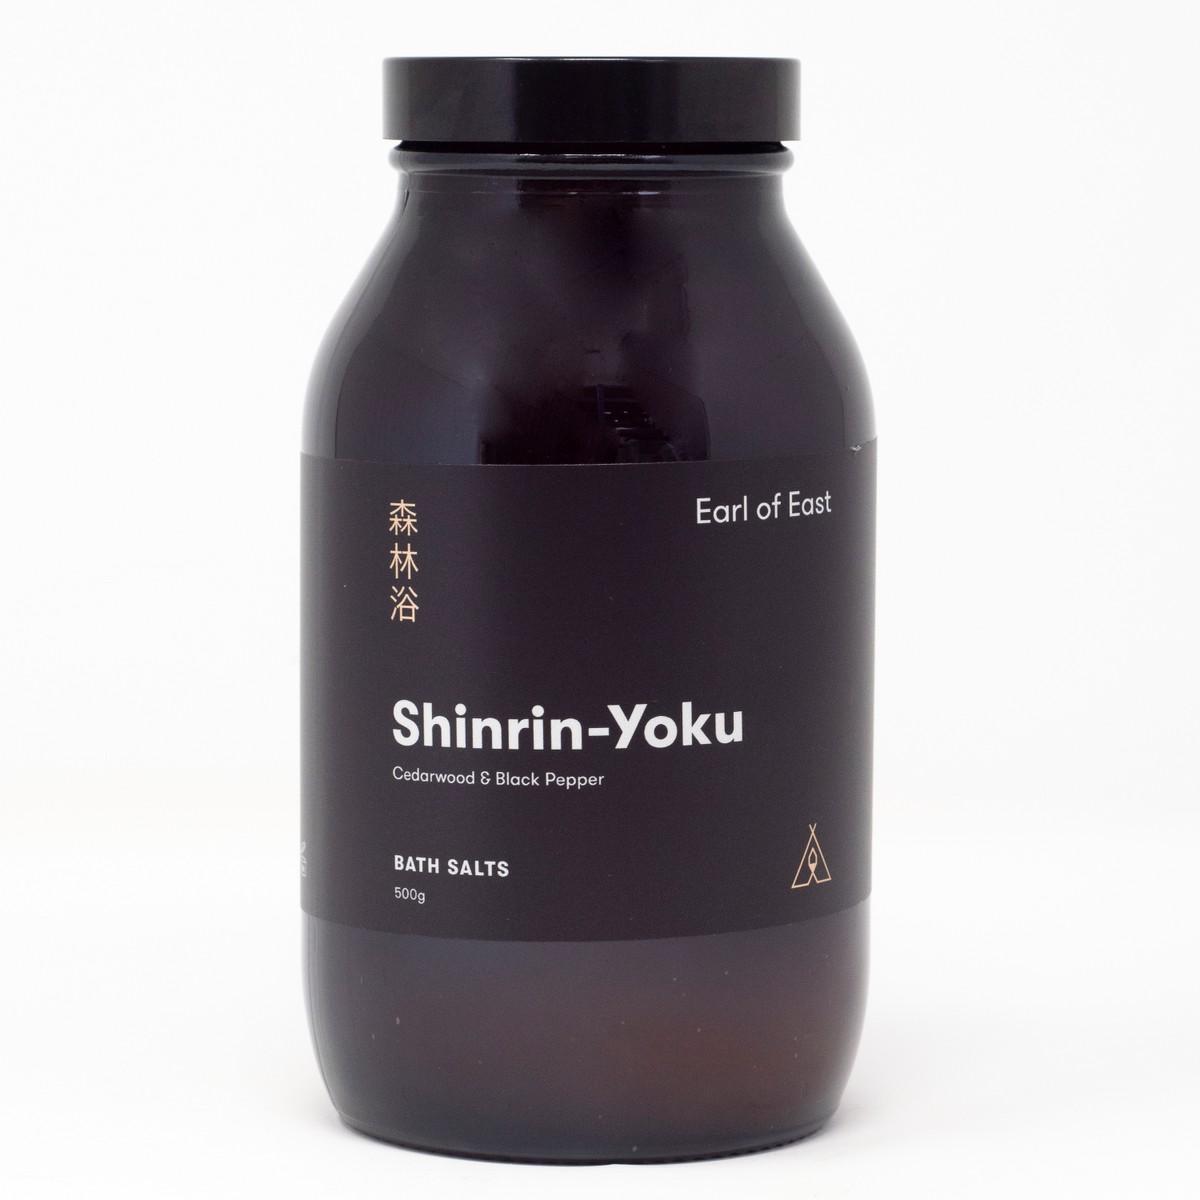 Photo of Shinrinyoku Bath Salts